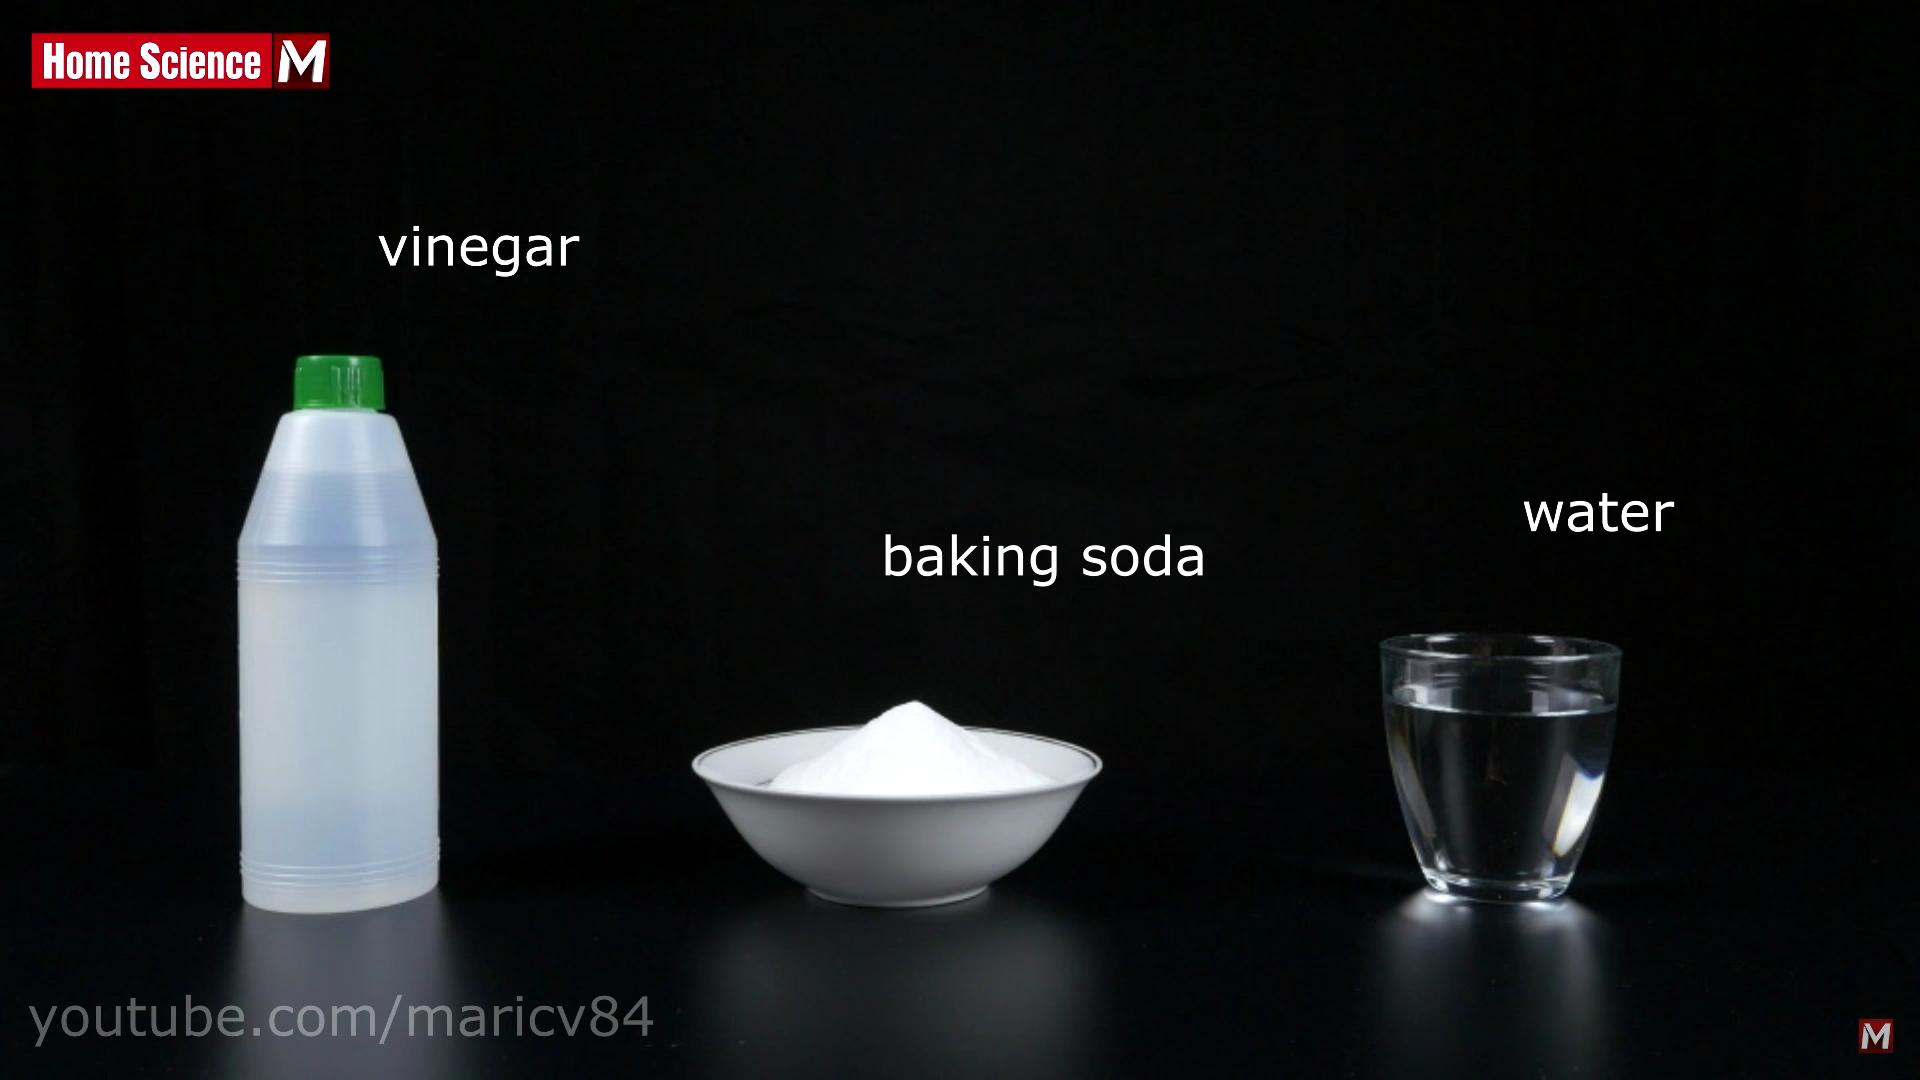 hielo caliente 2